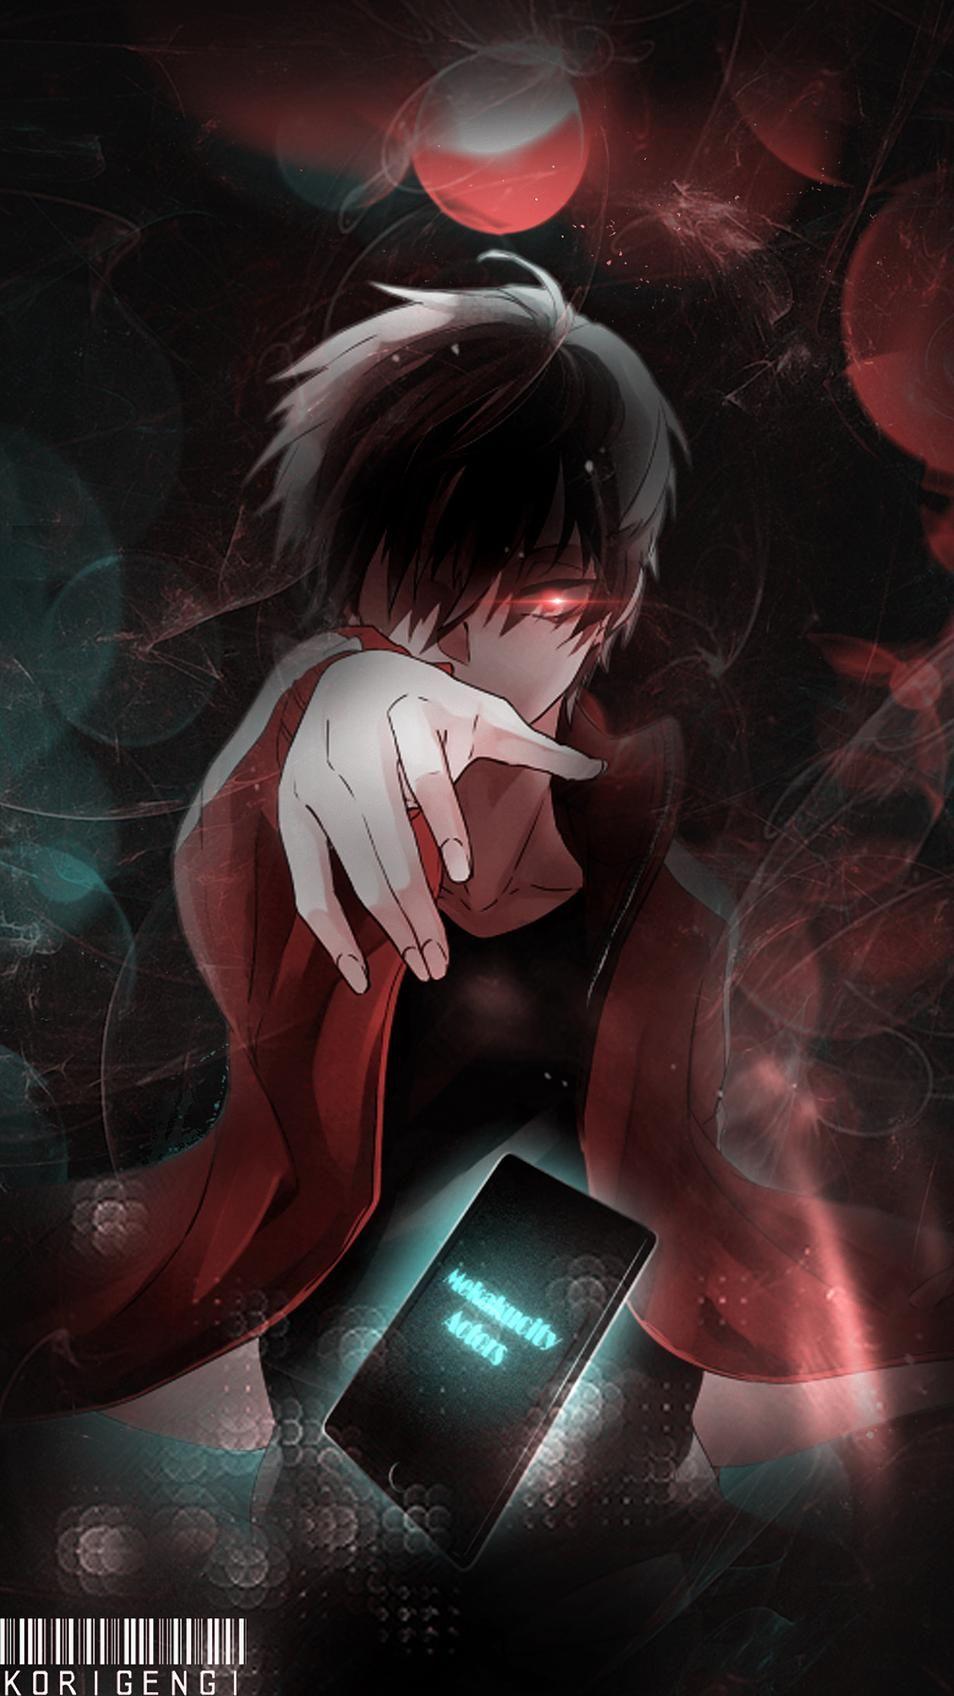 Zippyshare Com Free File Hosting Evil Anime Cool Anime Wallpapers Anime Drawings Boy